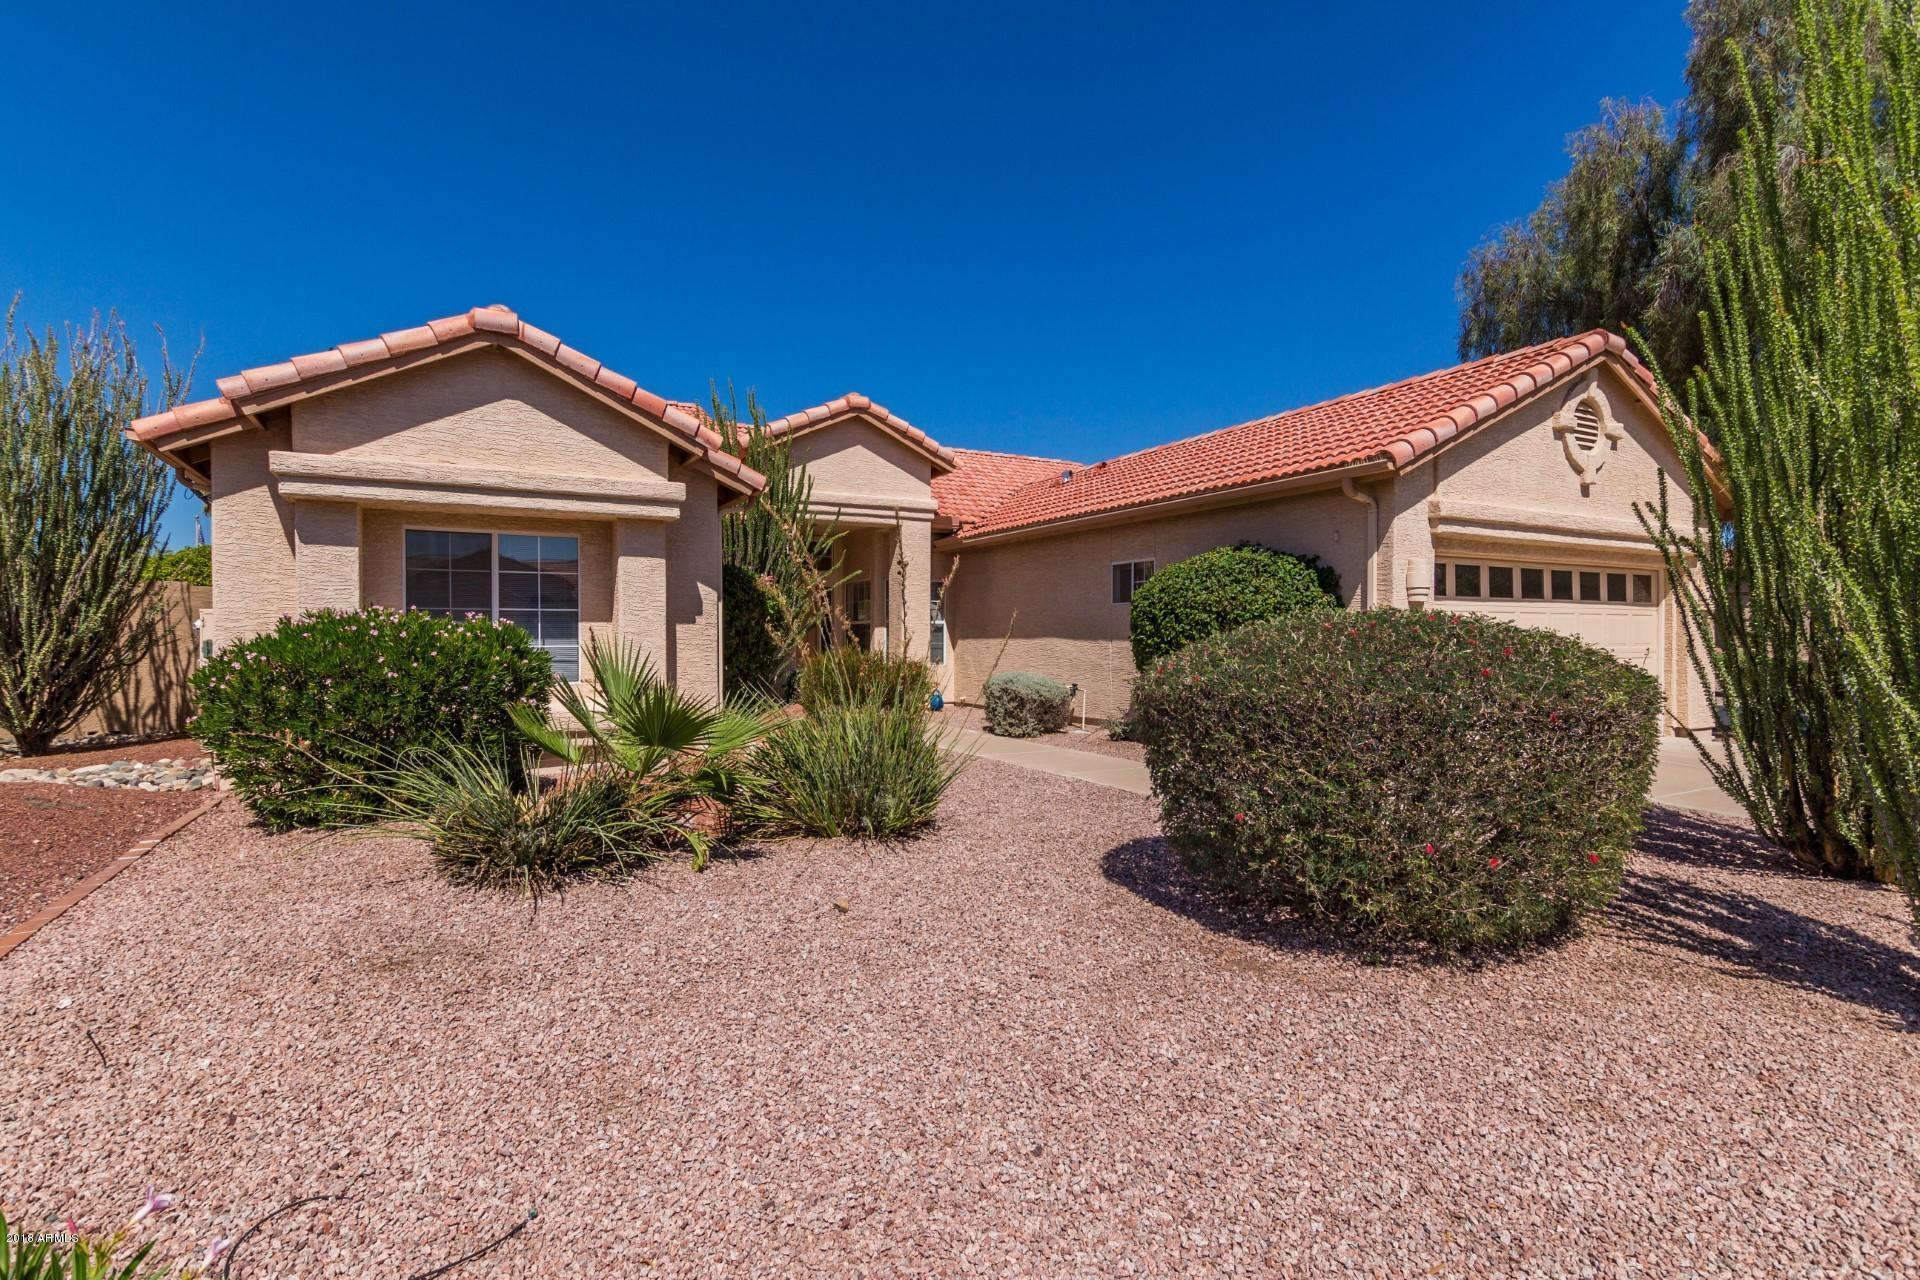 Photo for 10714 E Halley Drive, Sun Lakes, AZ 85248 (MLS # 5828439)